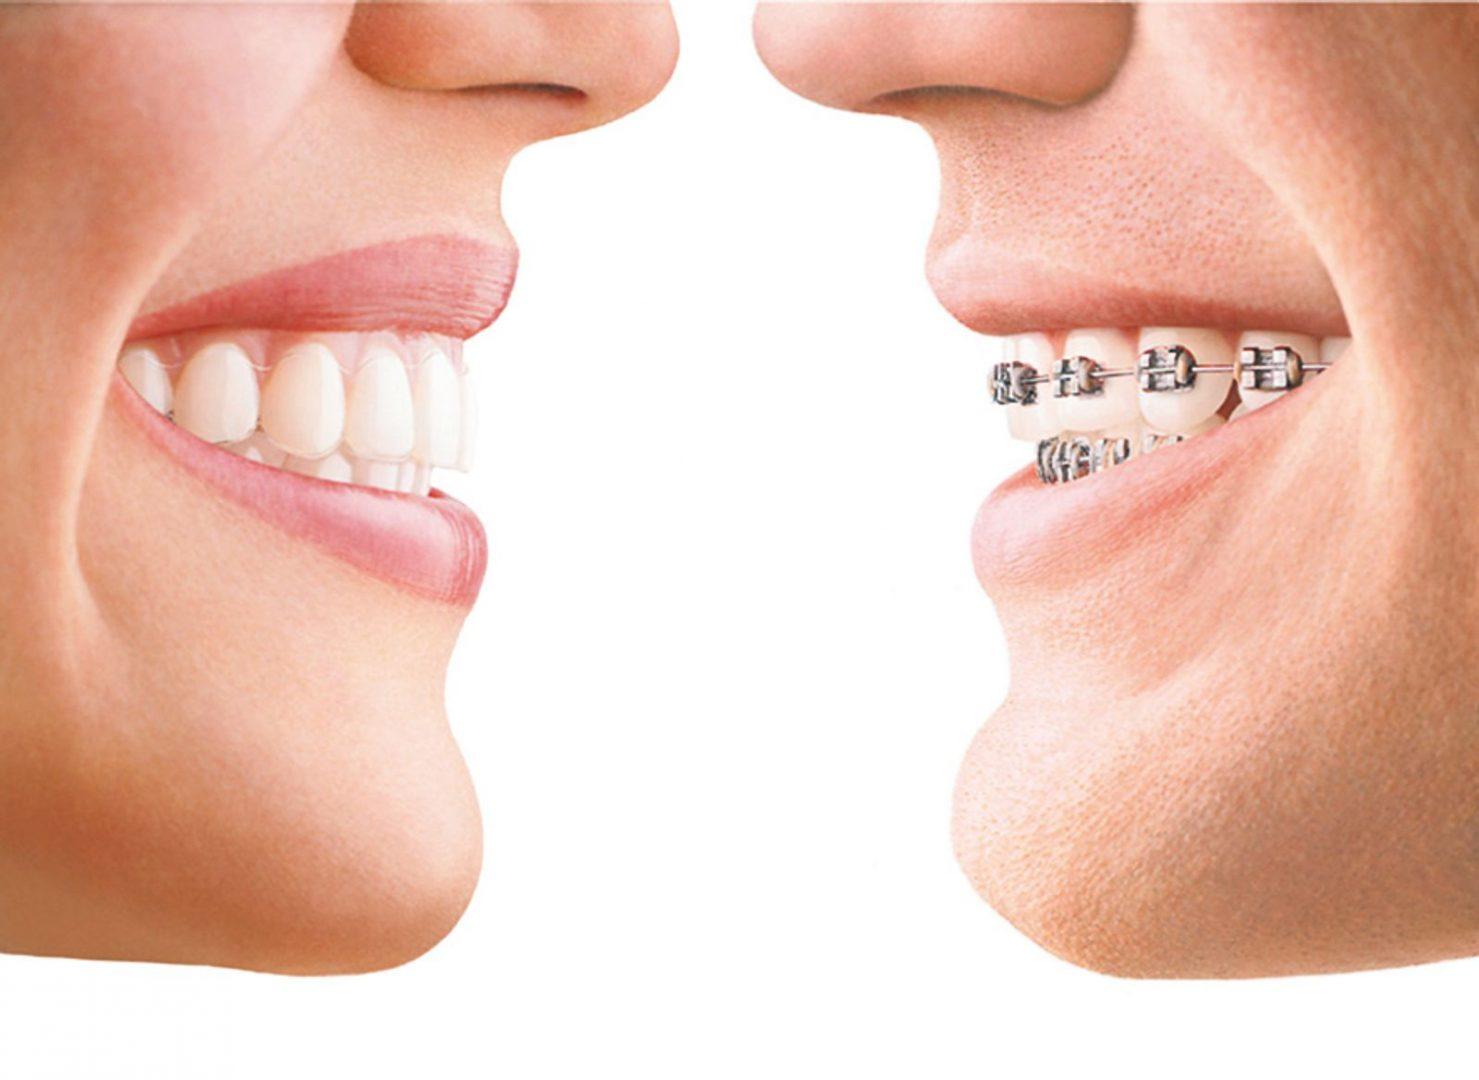 traitement Invisalign versus broches conventionnelles